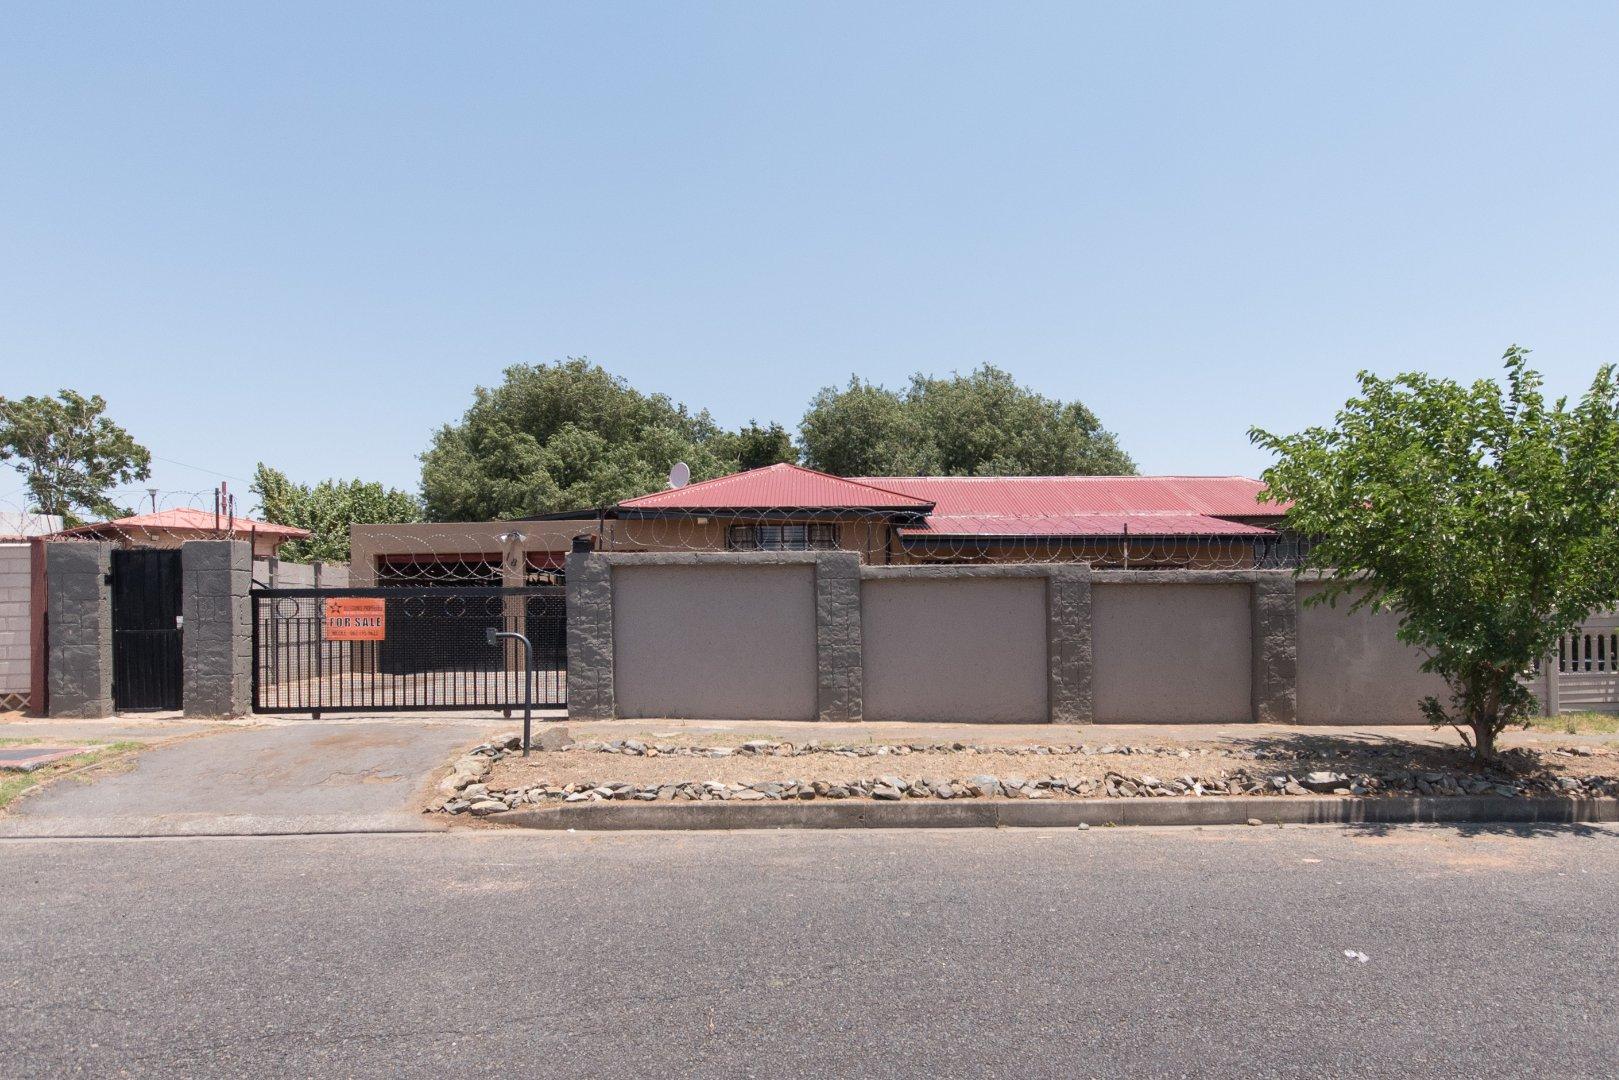 Property for Sale by Nicole   Zahiya Ferreira, Townhouse, 4 Bedrooms - ZAR 850,000